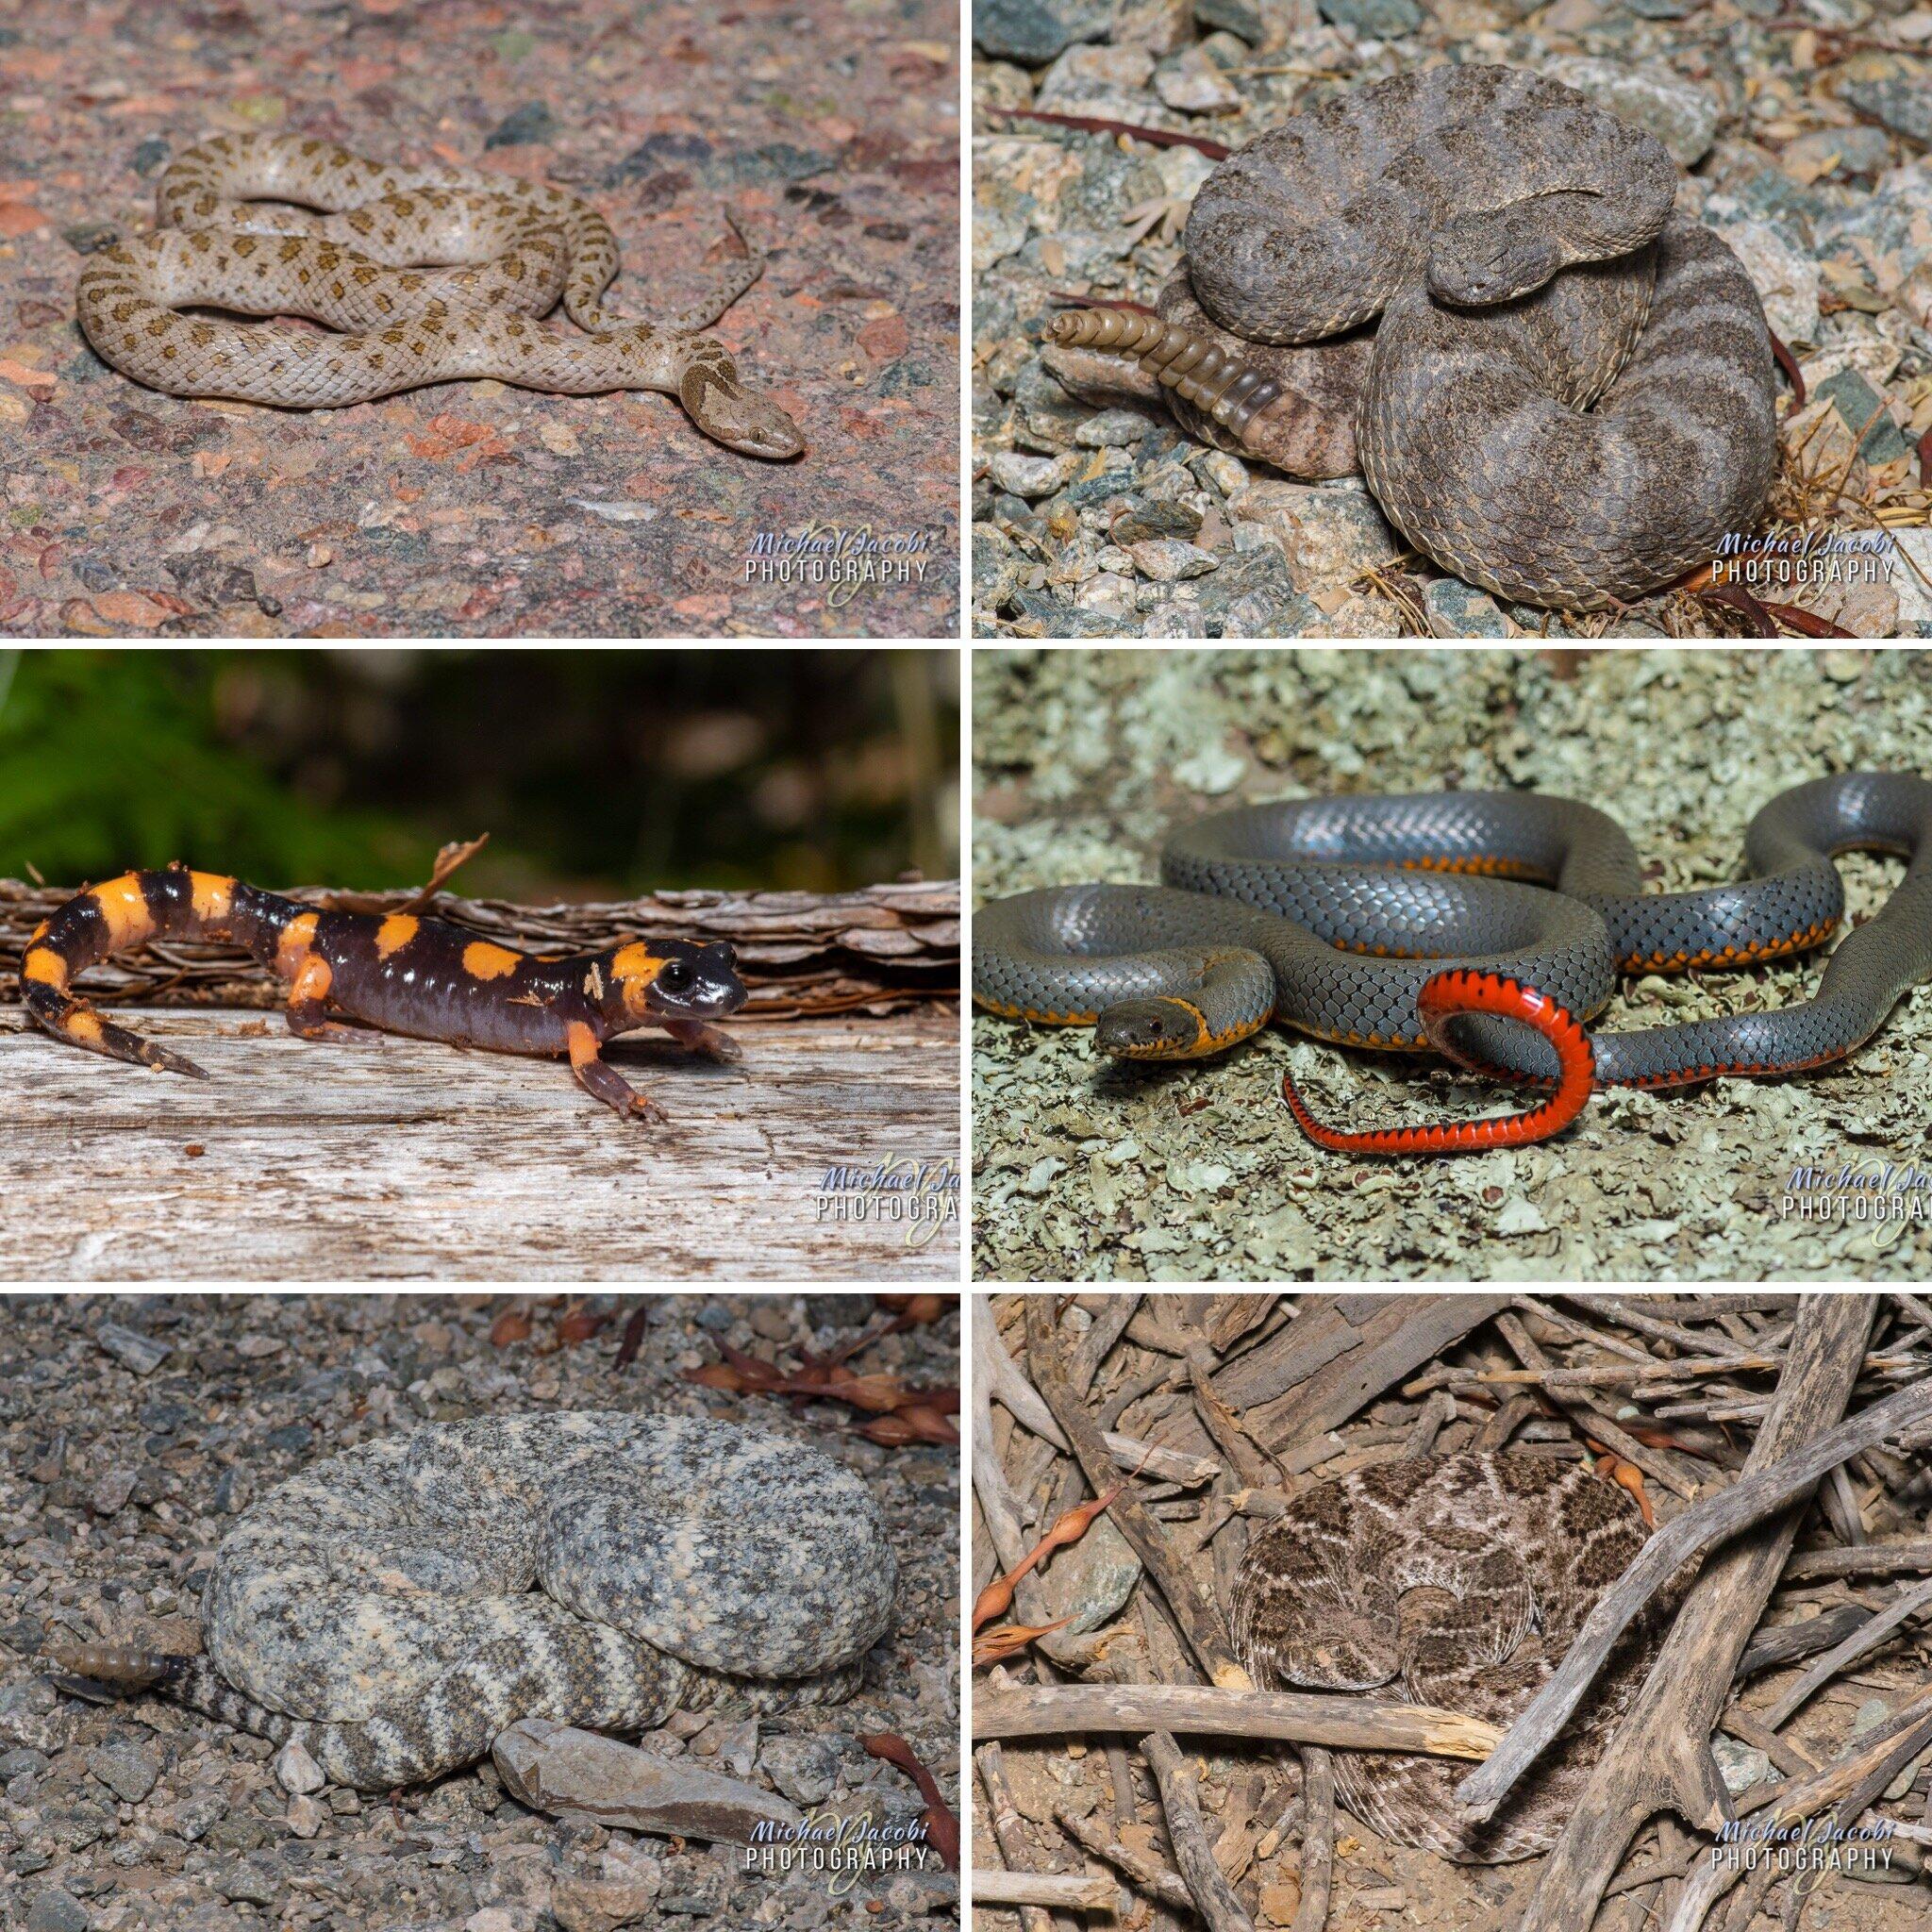 Top: Desert Nightsnake -  Hyspiglena chlorophaea , Tiger Rattlesnake -  Crotalus tigris ; Middle: Large-blotched Ensatina -  Ensatina eschscholtzii klauberi,  Regal Ringneck Snake -  Diadophis punctatus regalis ; Bottom: Southwestern Speckled Rattlesnake -  Crotalus pyrrhu s, Western Diamondback Rattlesnake -  Crotalus atrox